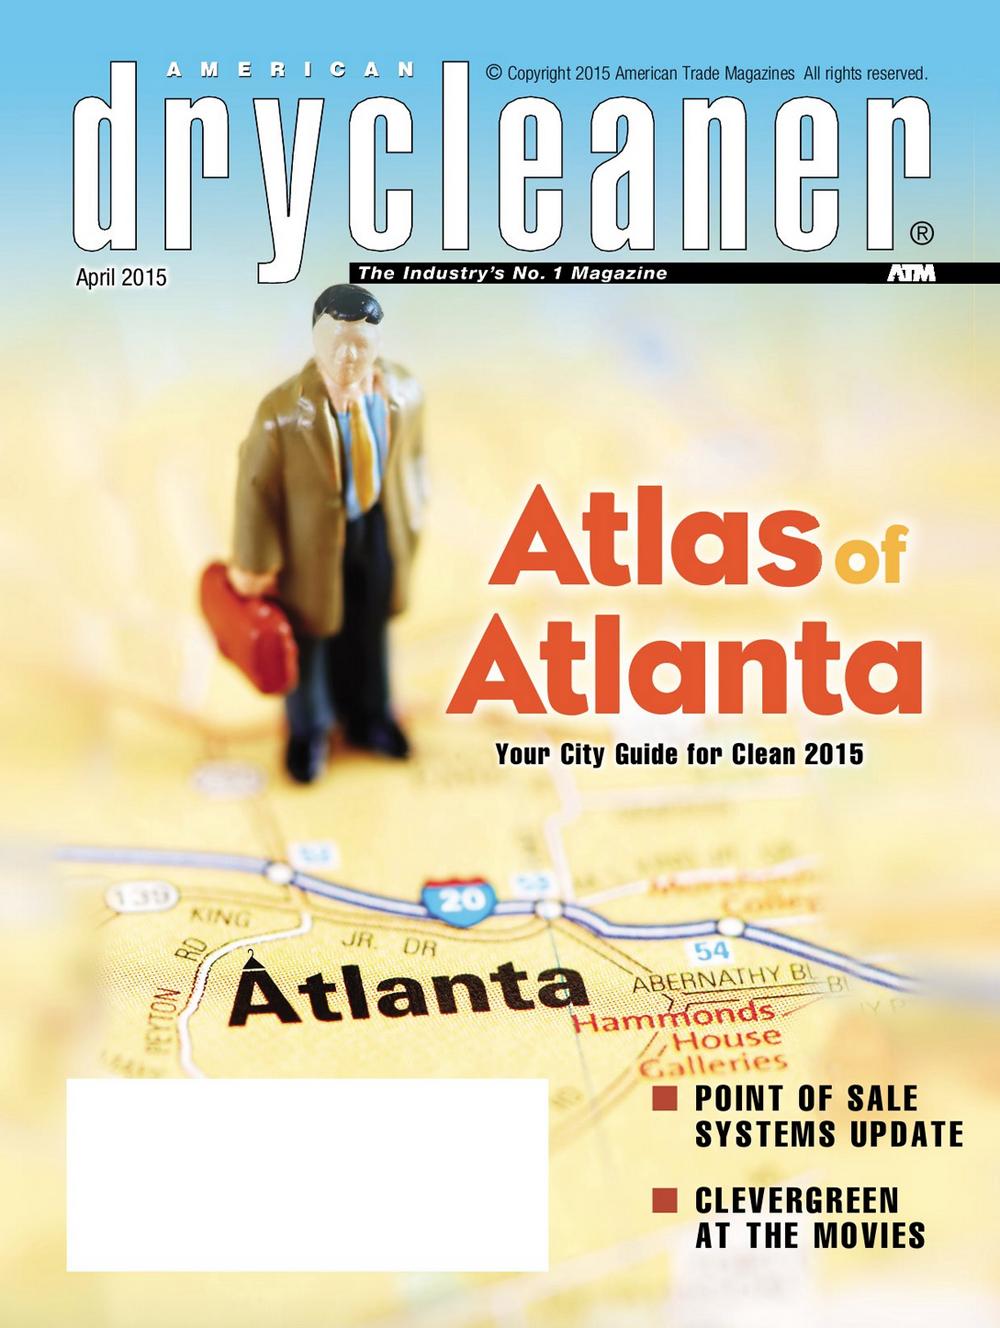 American Dry Cleaner Magazine - Boston Dry Cleaner, Boston Dry Cleaning Clevergreen Cleaners Featured